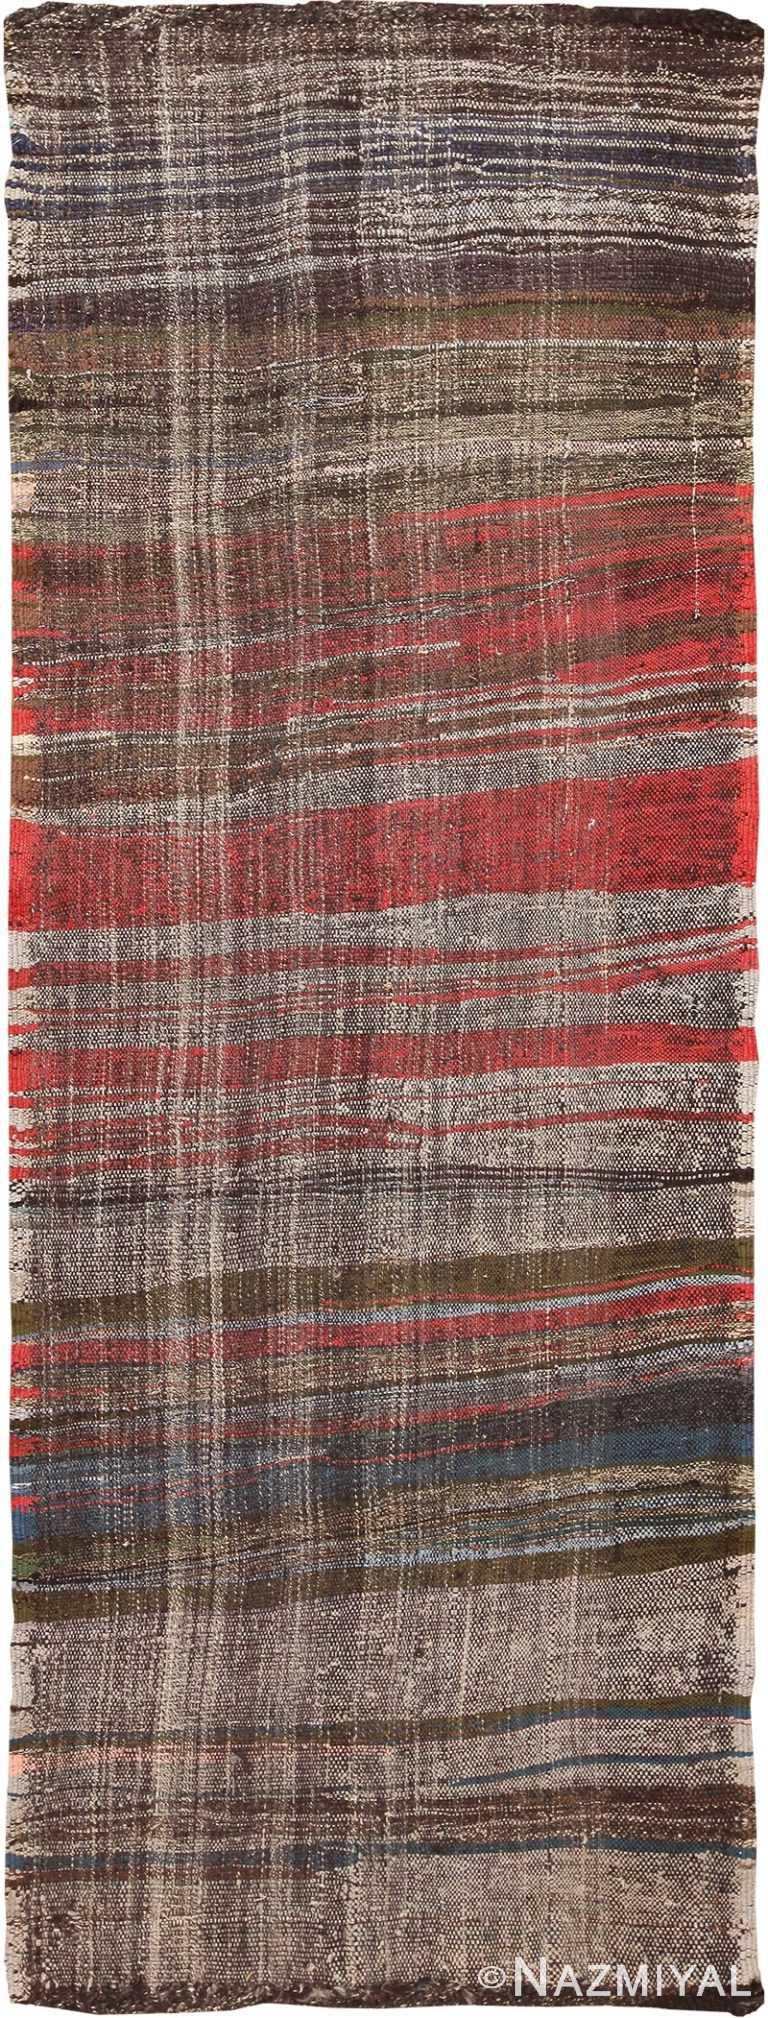 Vintage Persian Flat Weave Runner Rug 60366 by Nazmiyal NYC